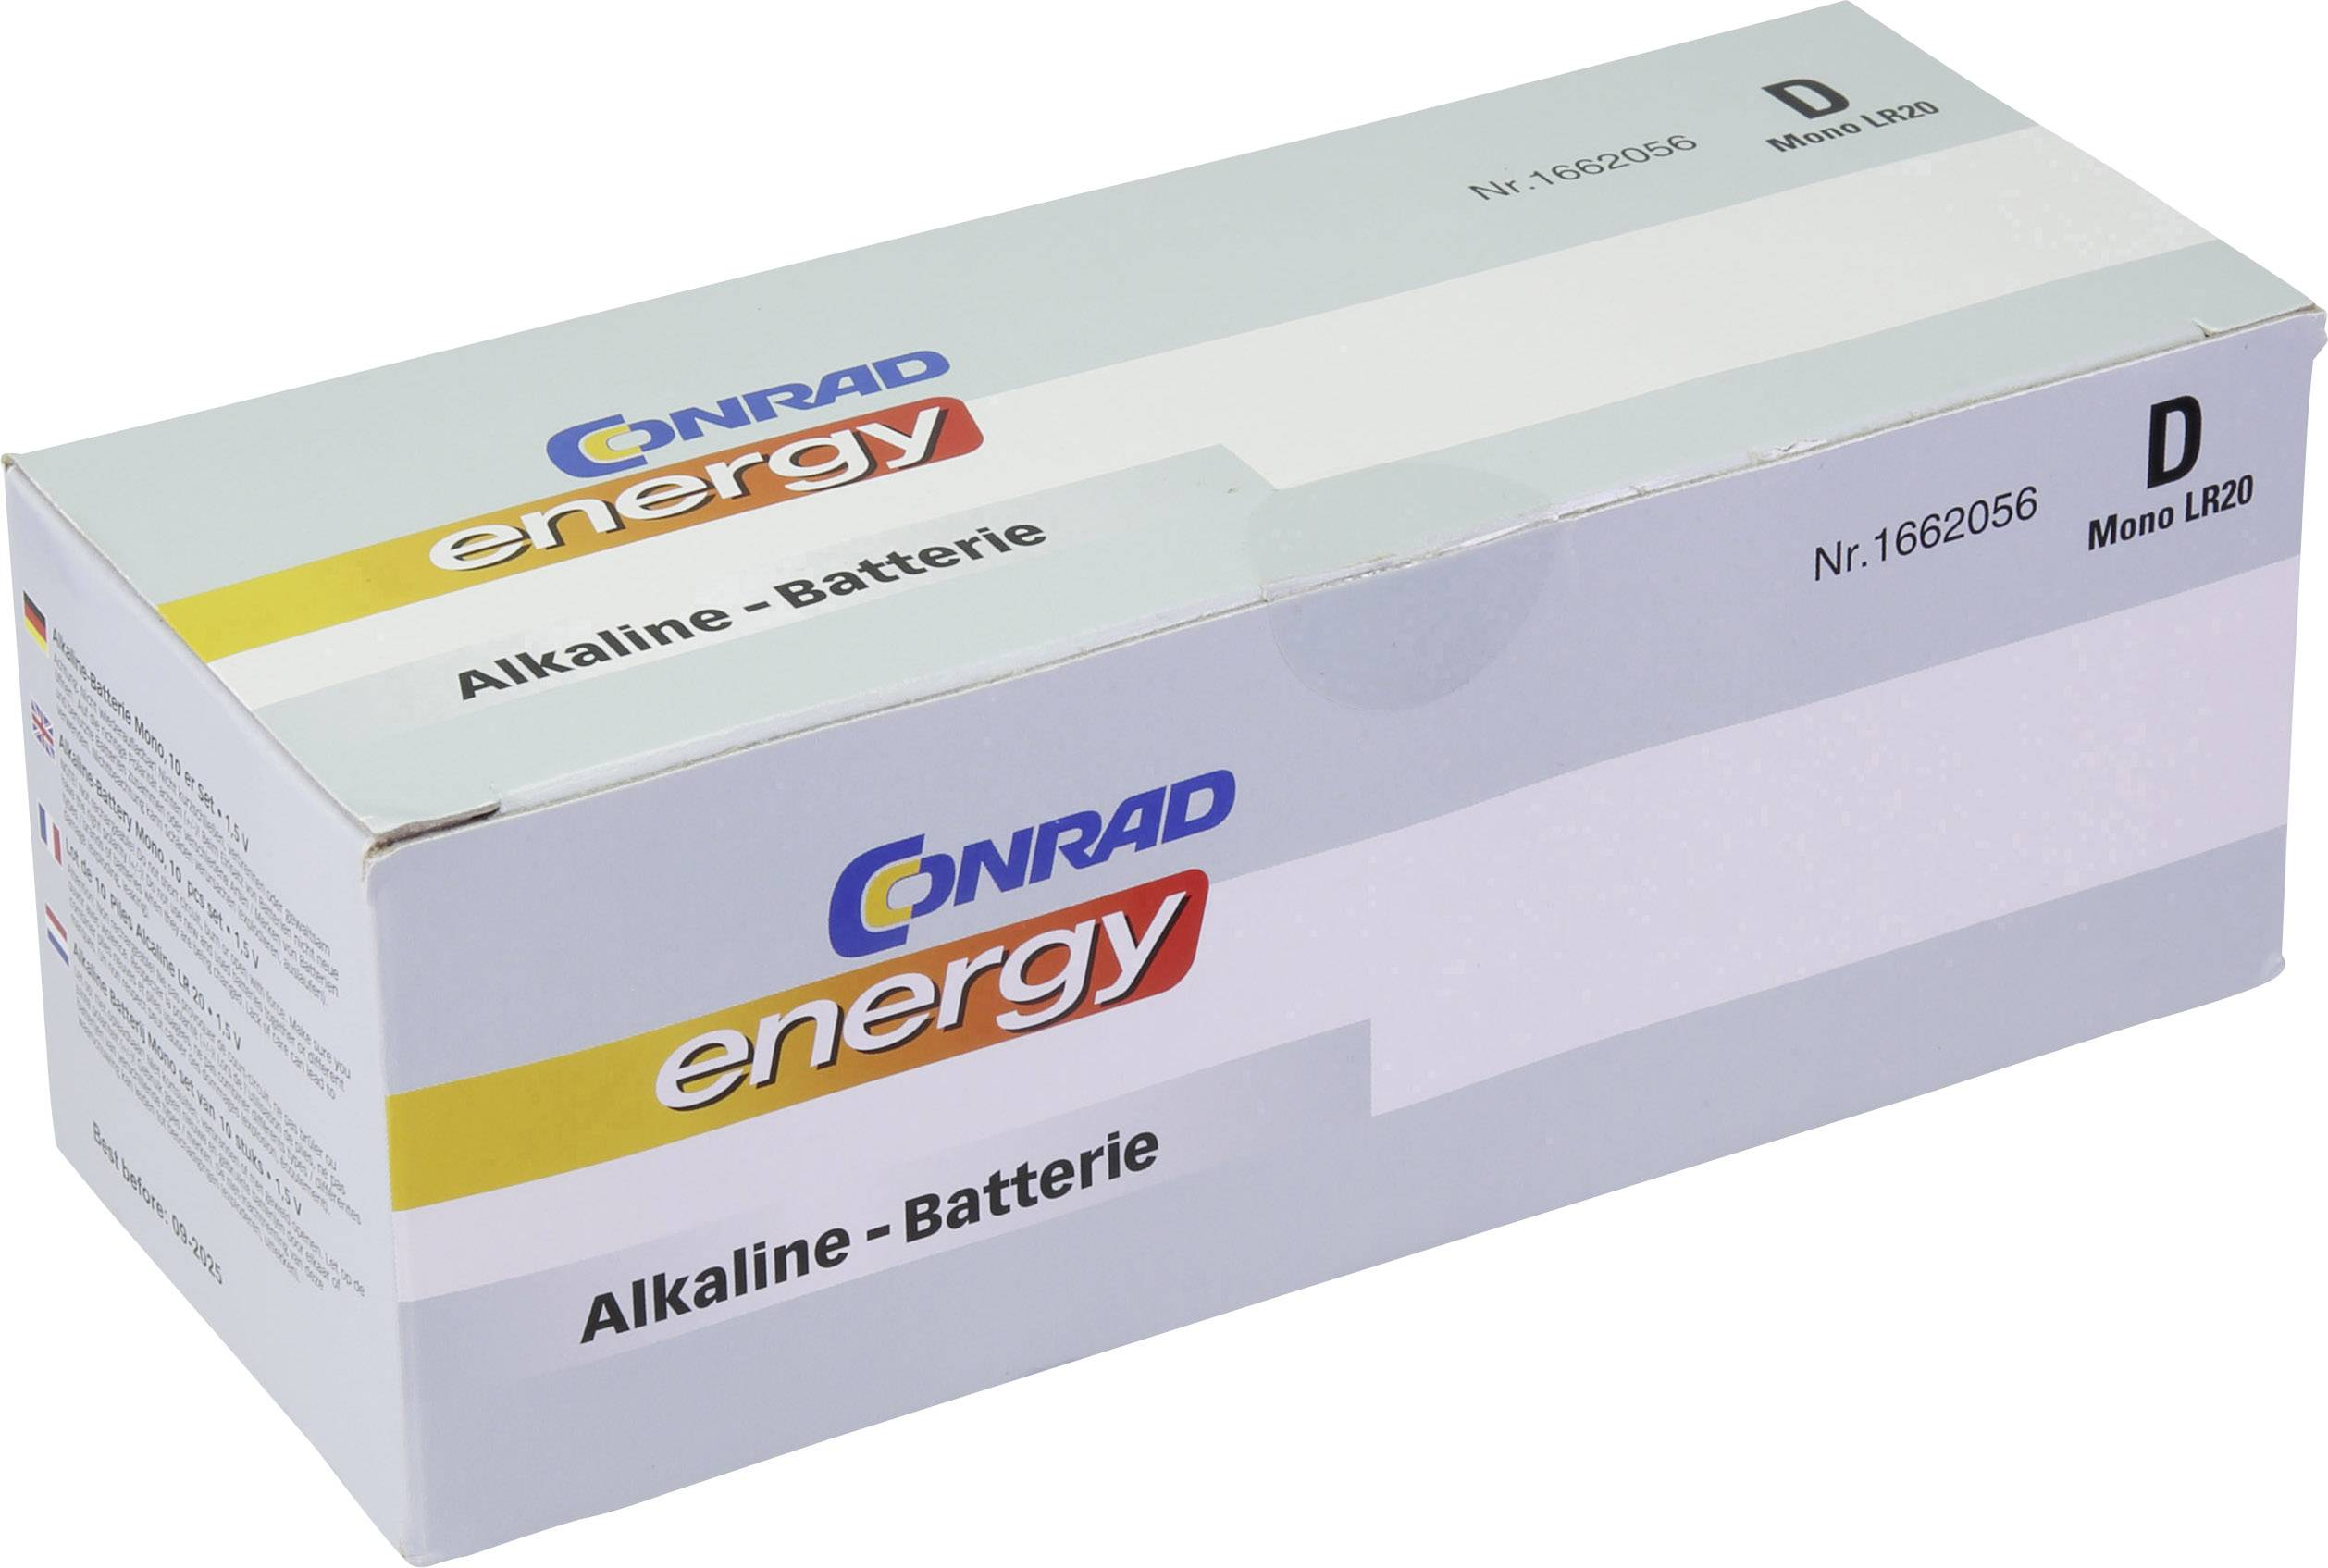 Baterie velké mono D alkalicko-manganová Conrad energy LR20 1.5 V 10 ks